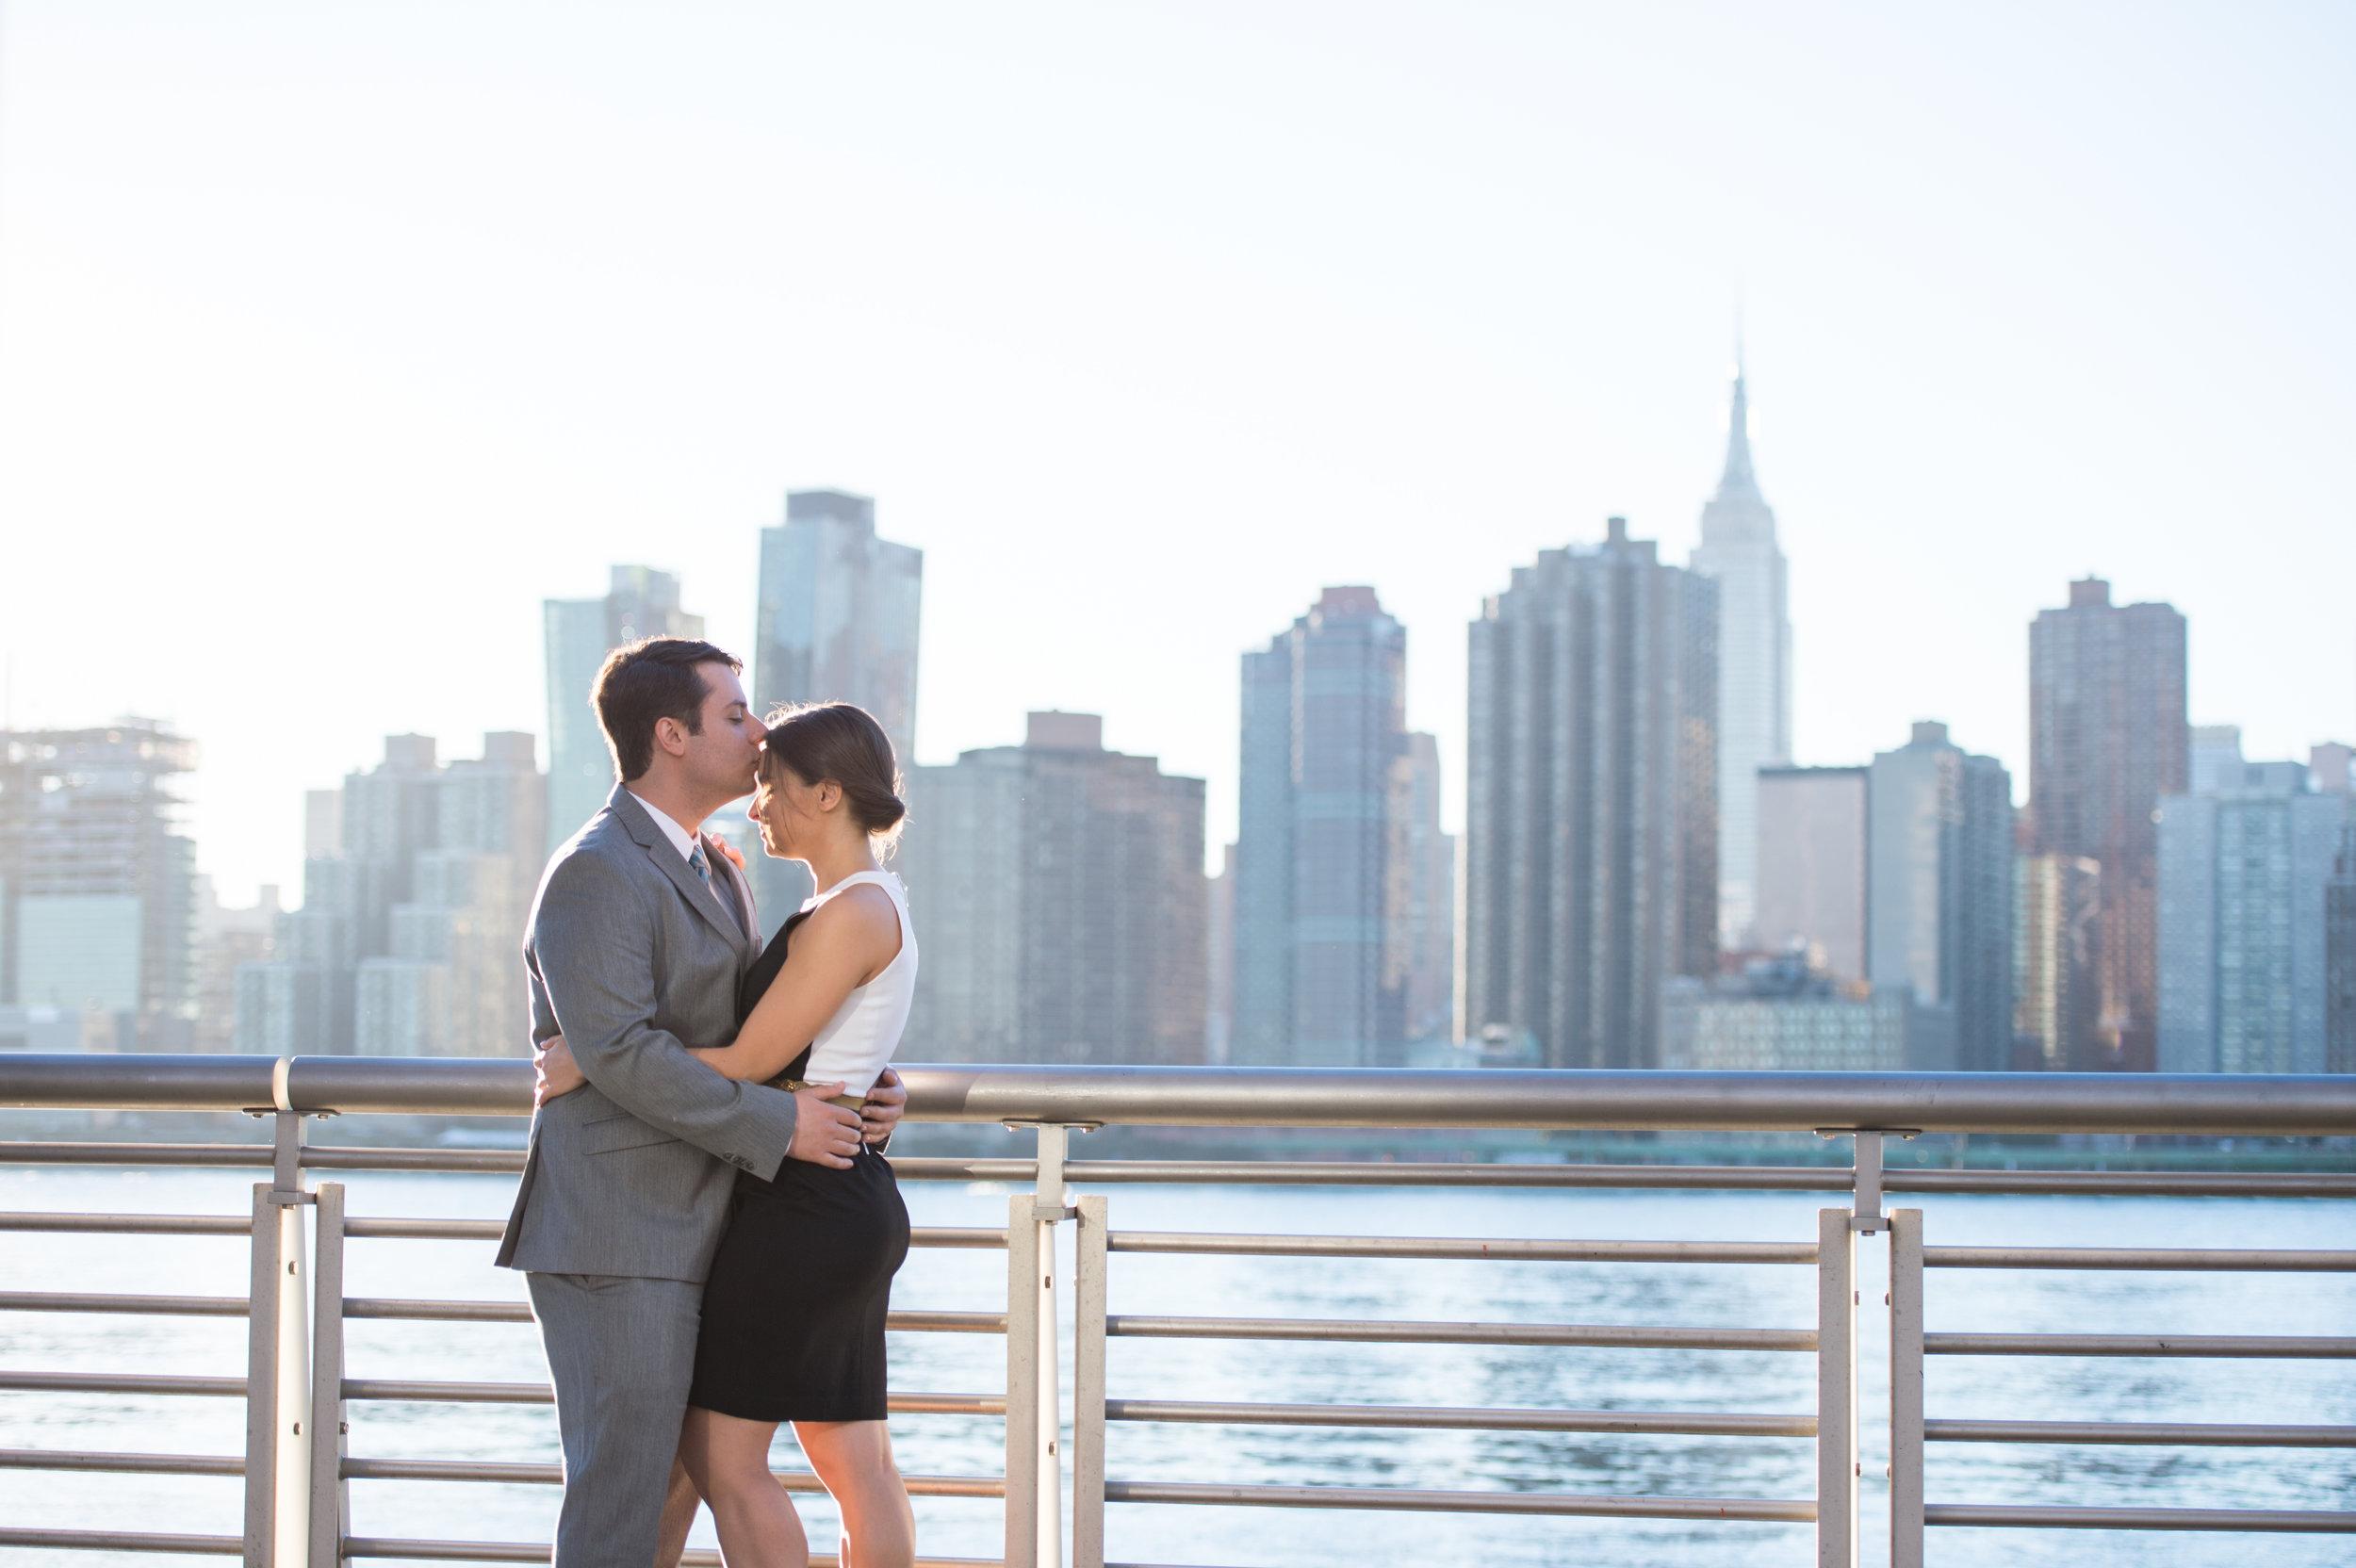 JessicaandAndrew.Engaged-15.jpg